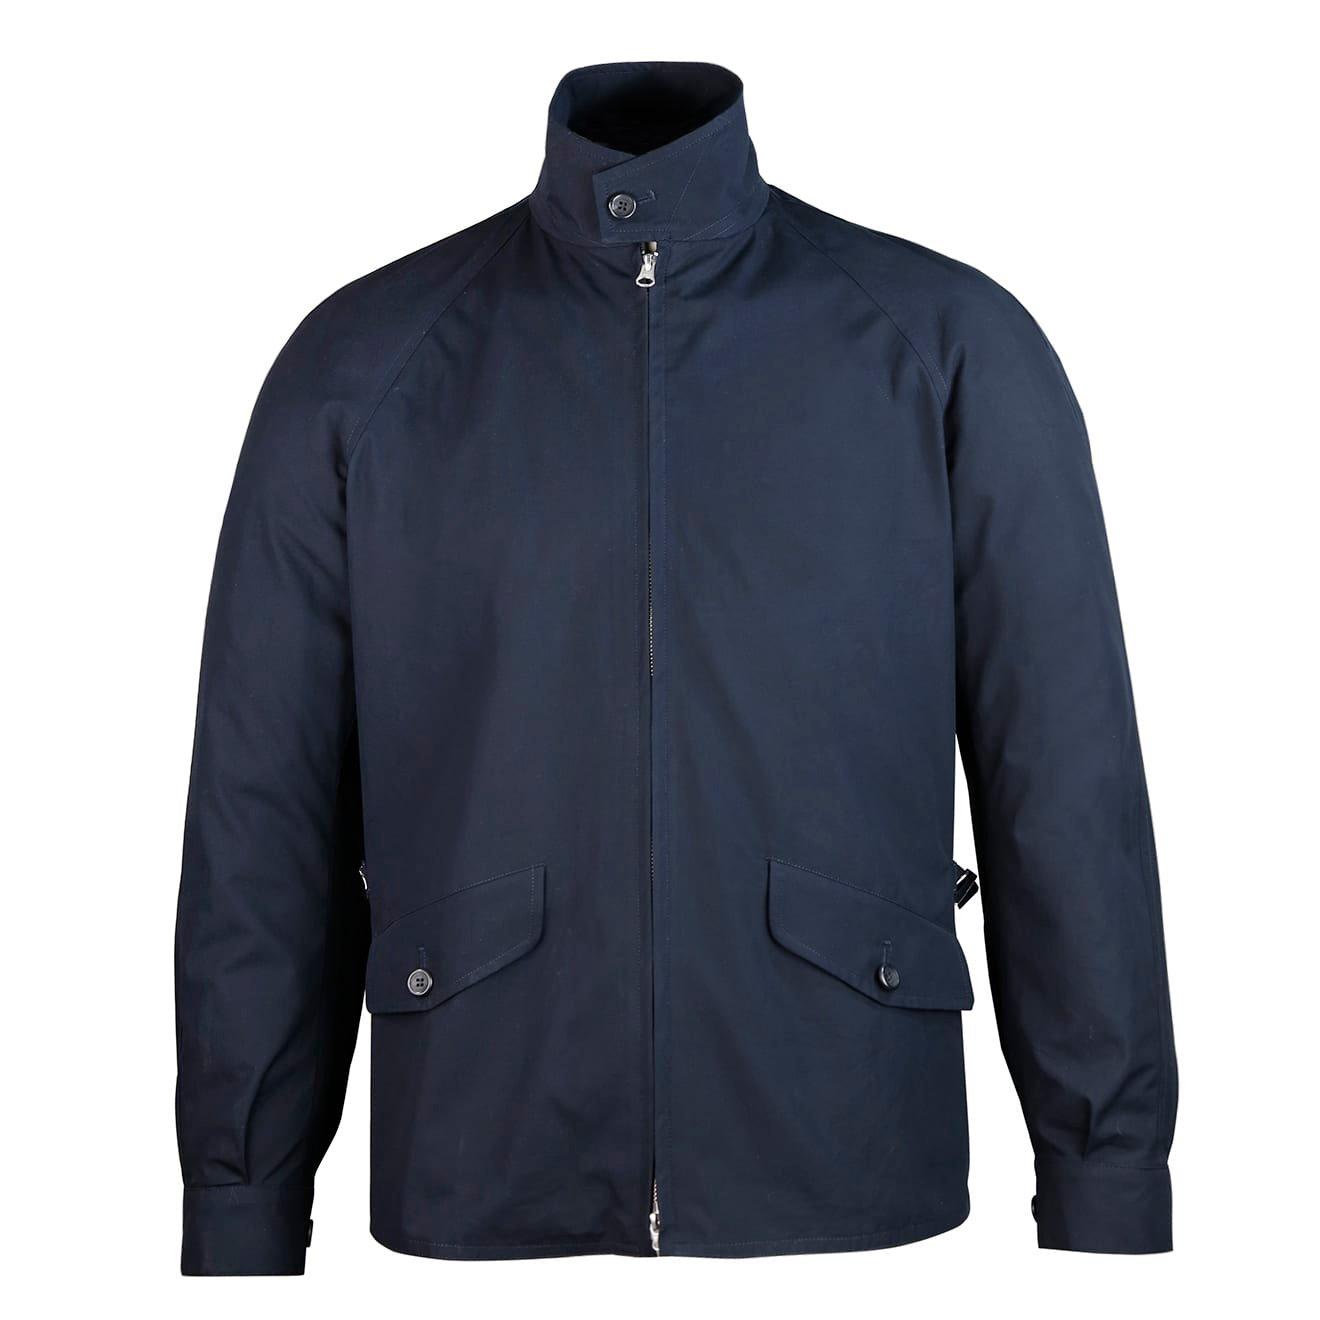 Grenfell Golfer Jacket Navy